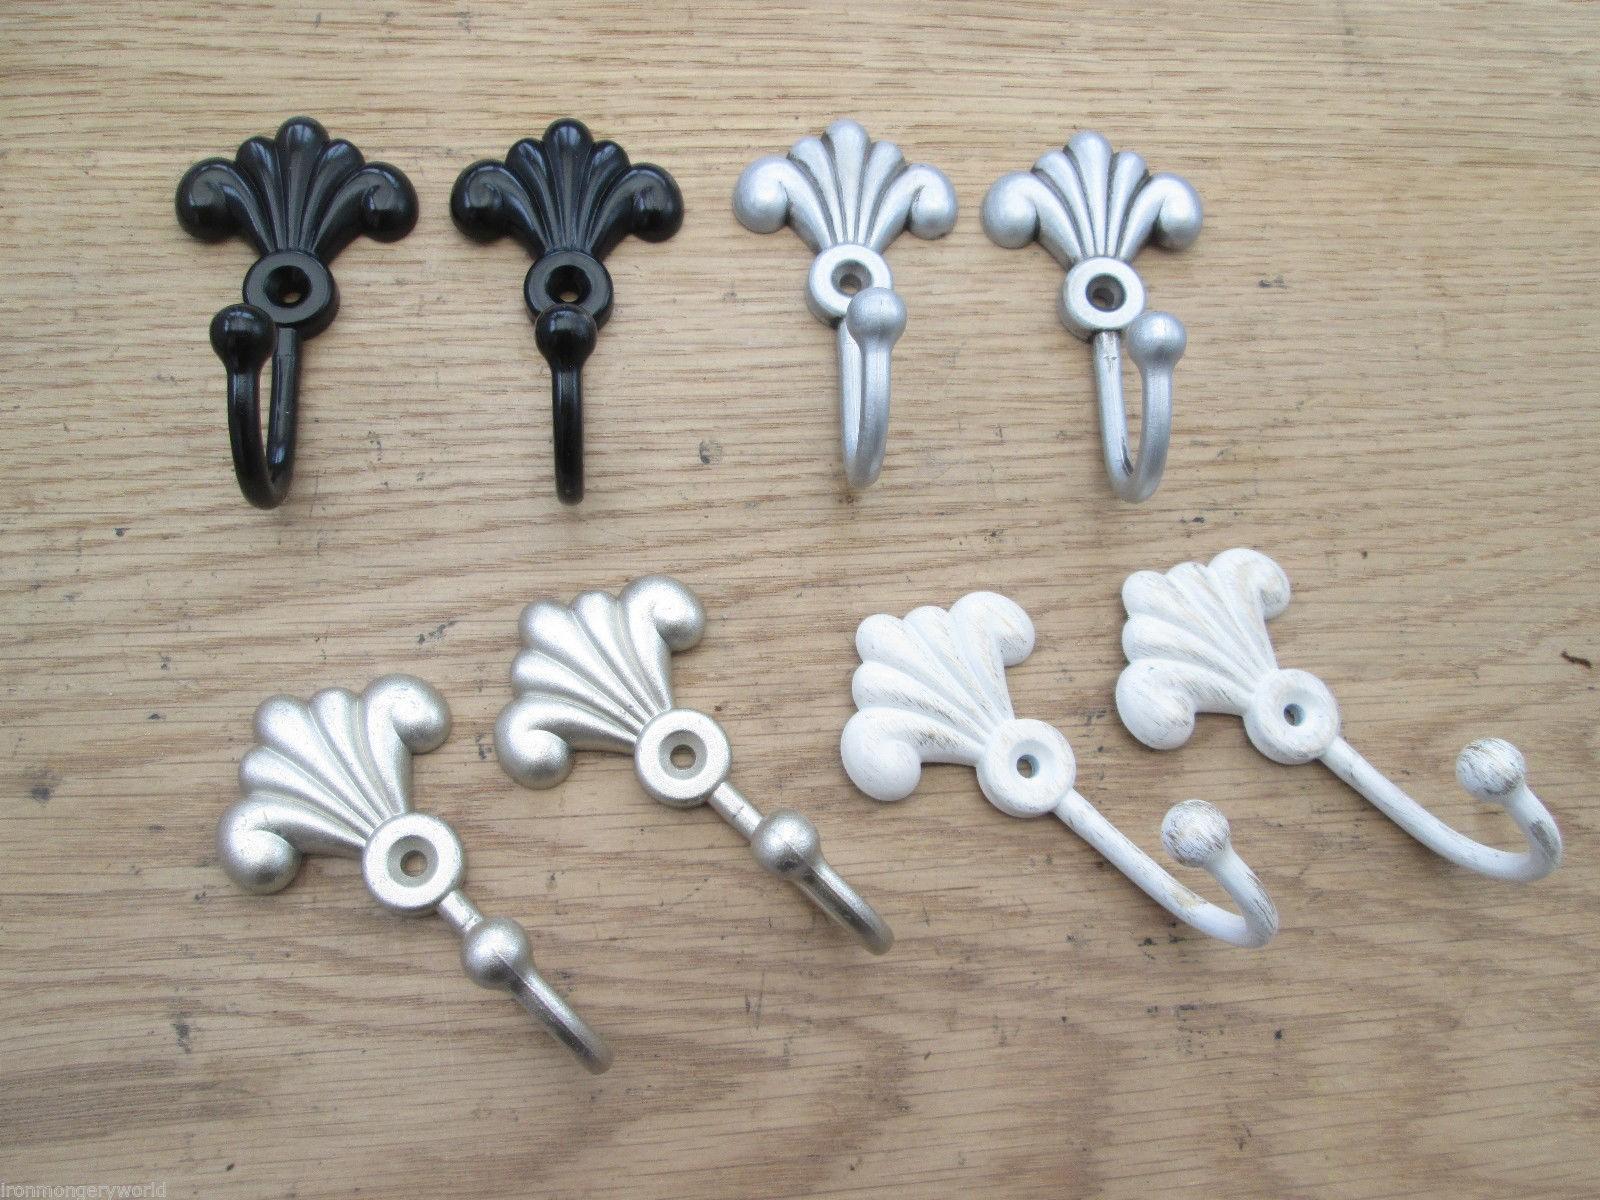 Fleur De Lys Curtain Tie Back Hook Ironmongery World